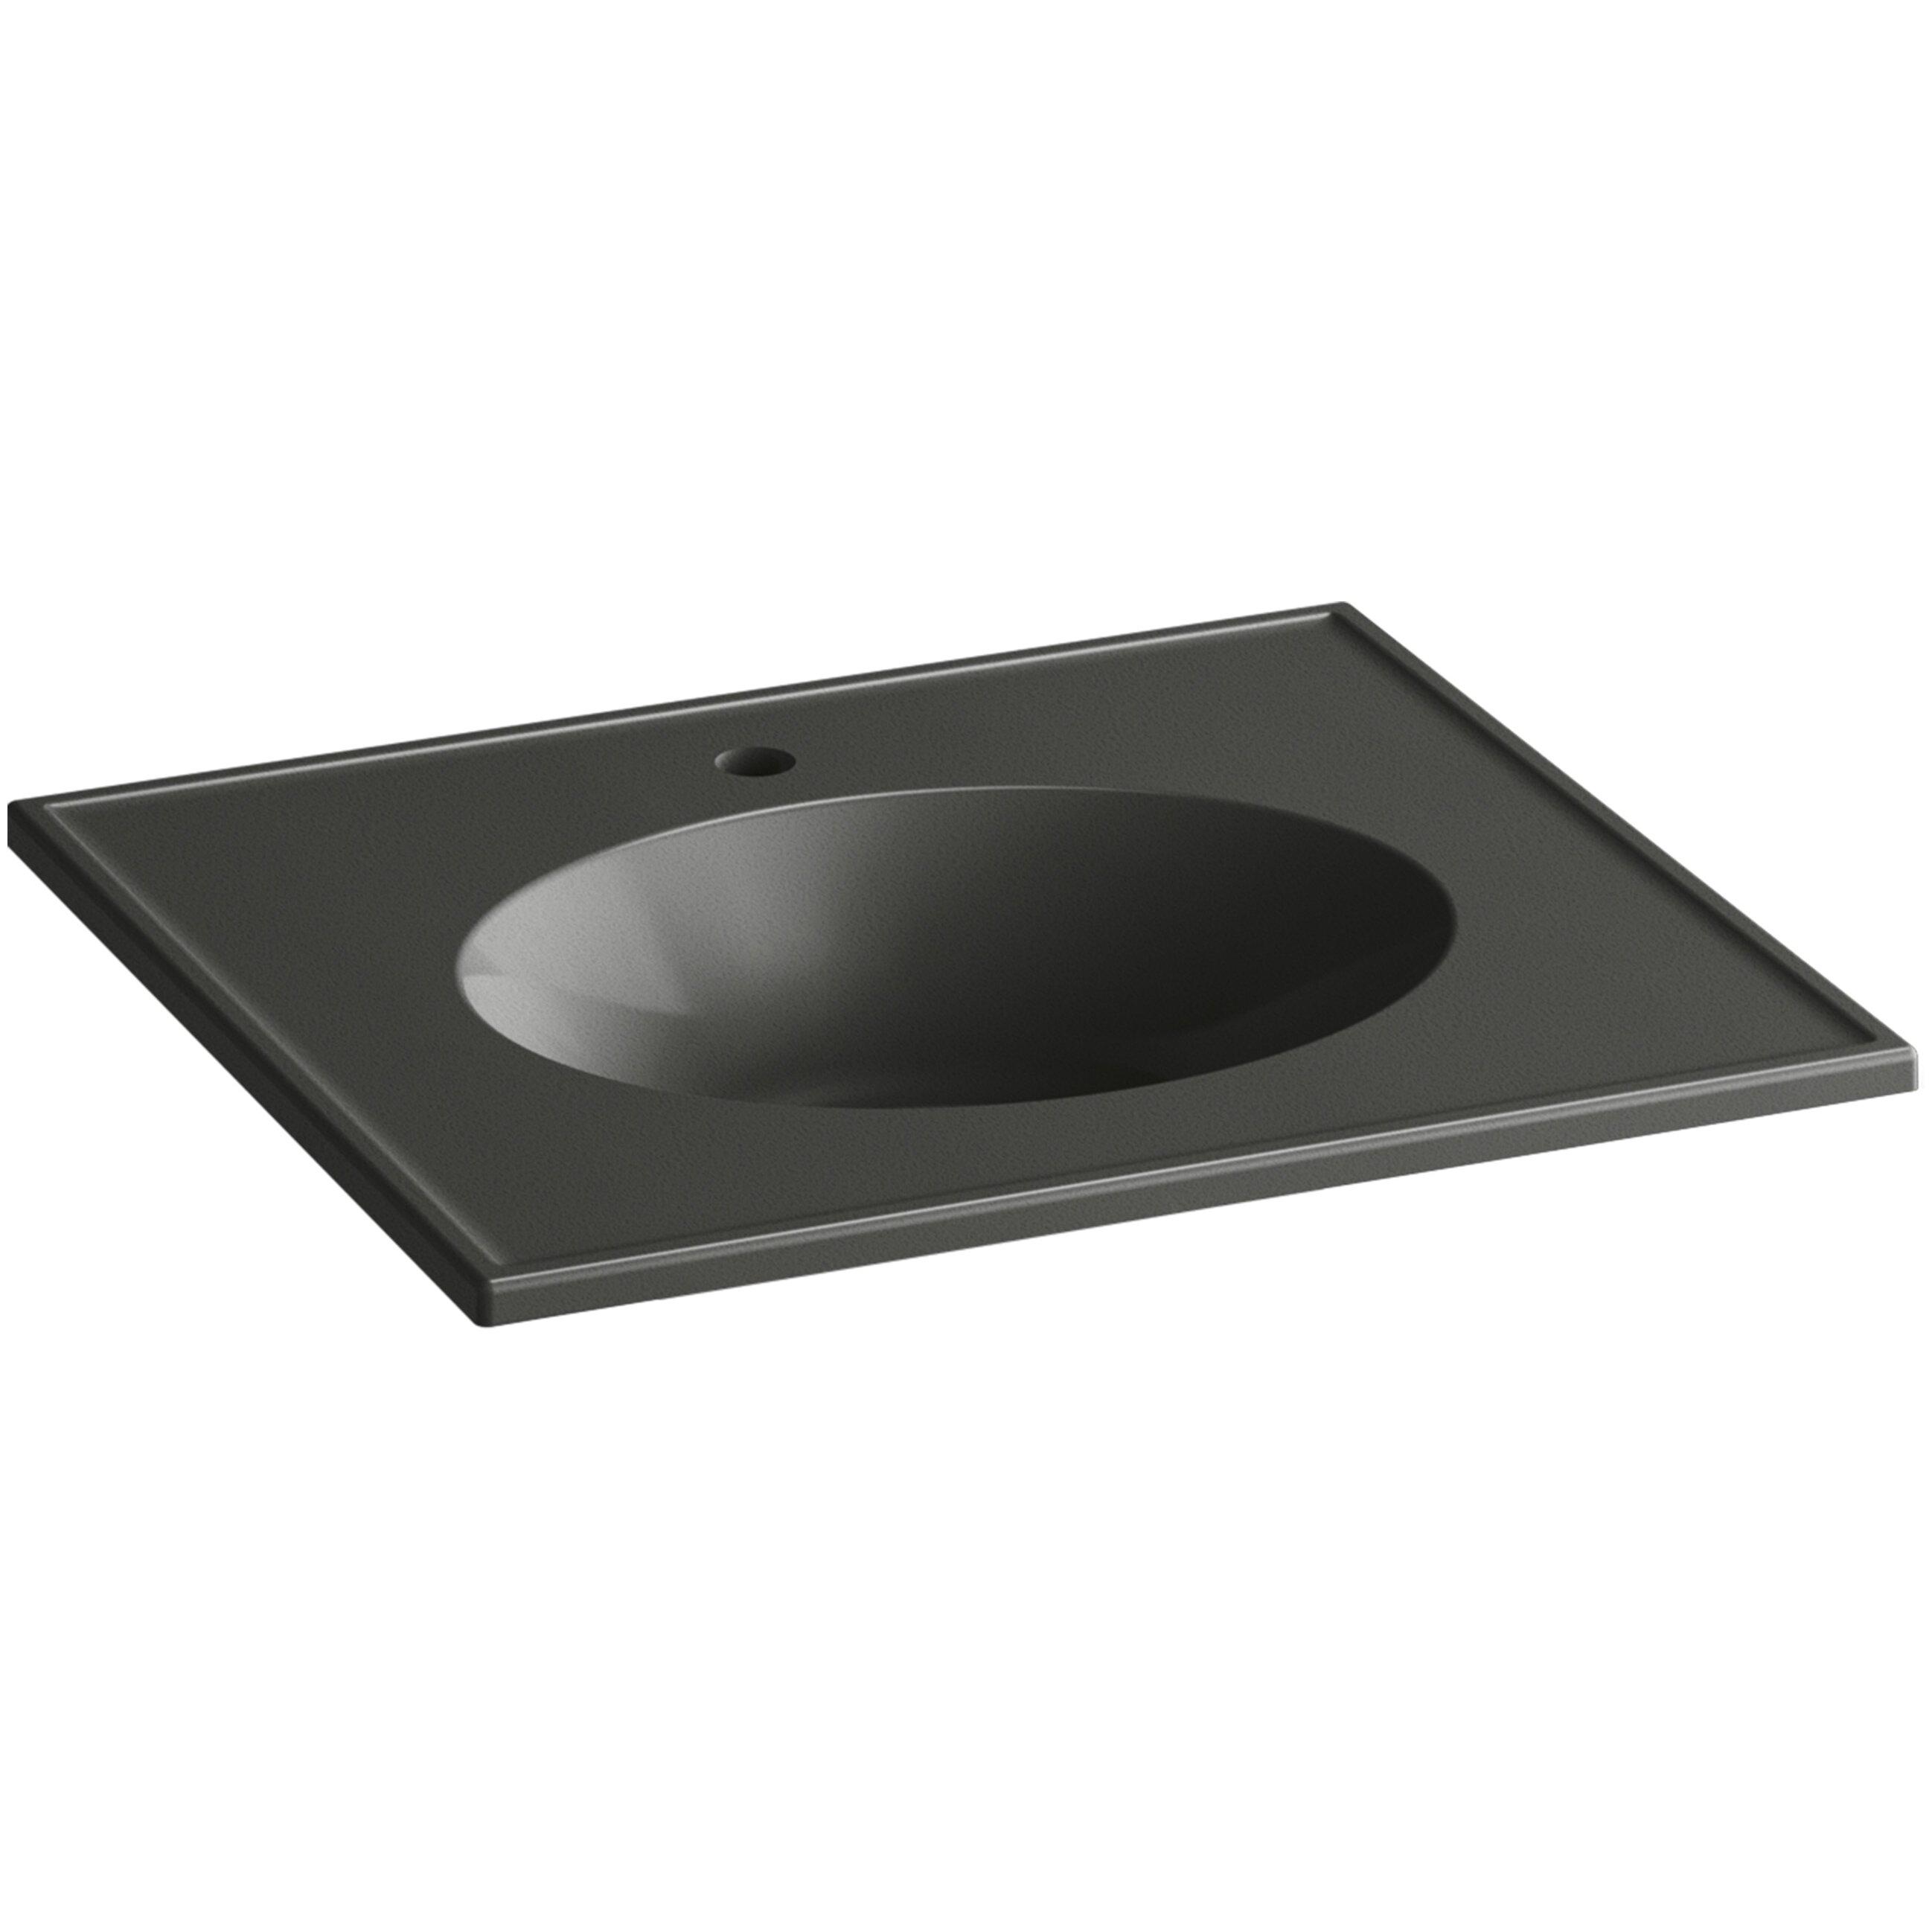 Kohler Ceramic/Impressions 25